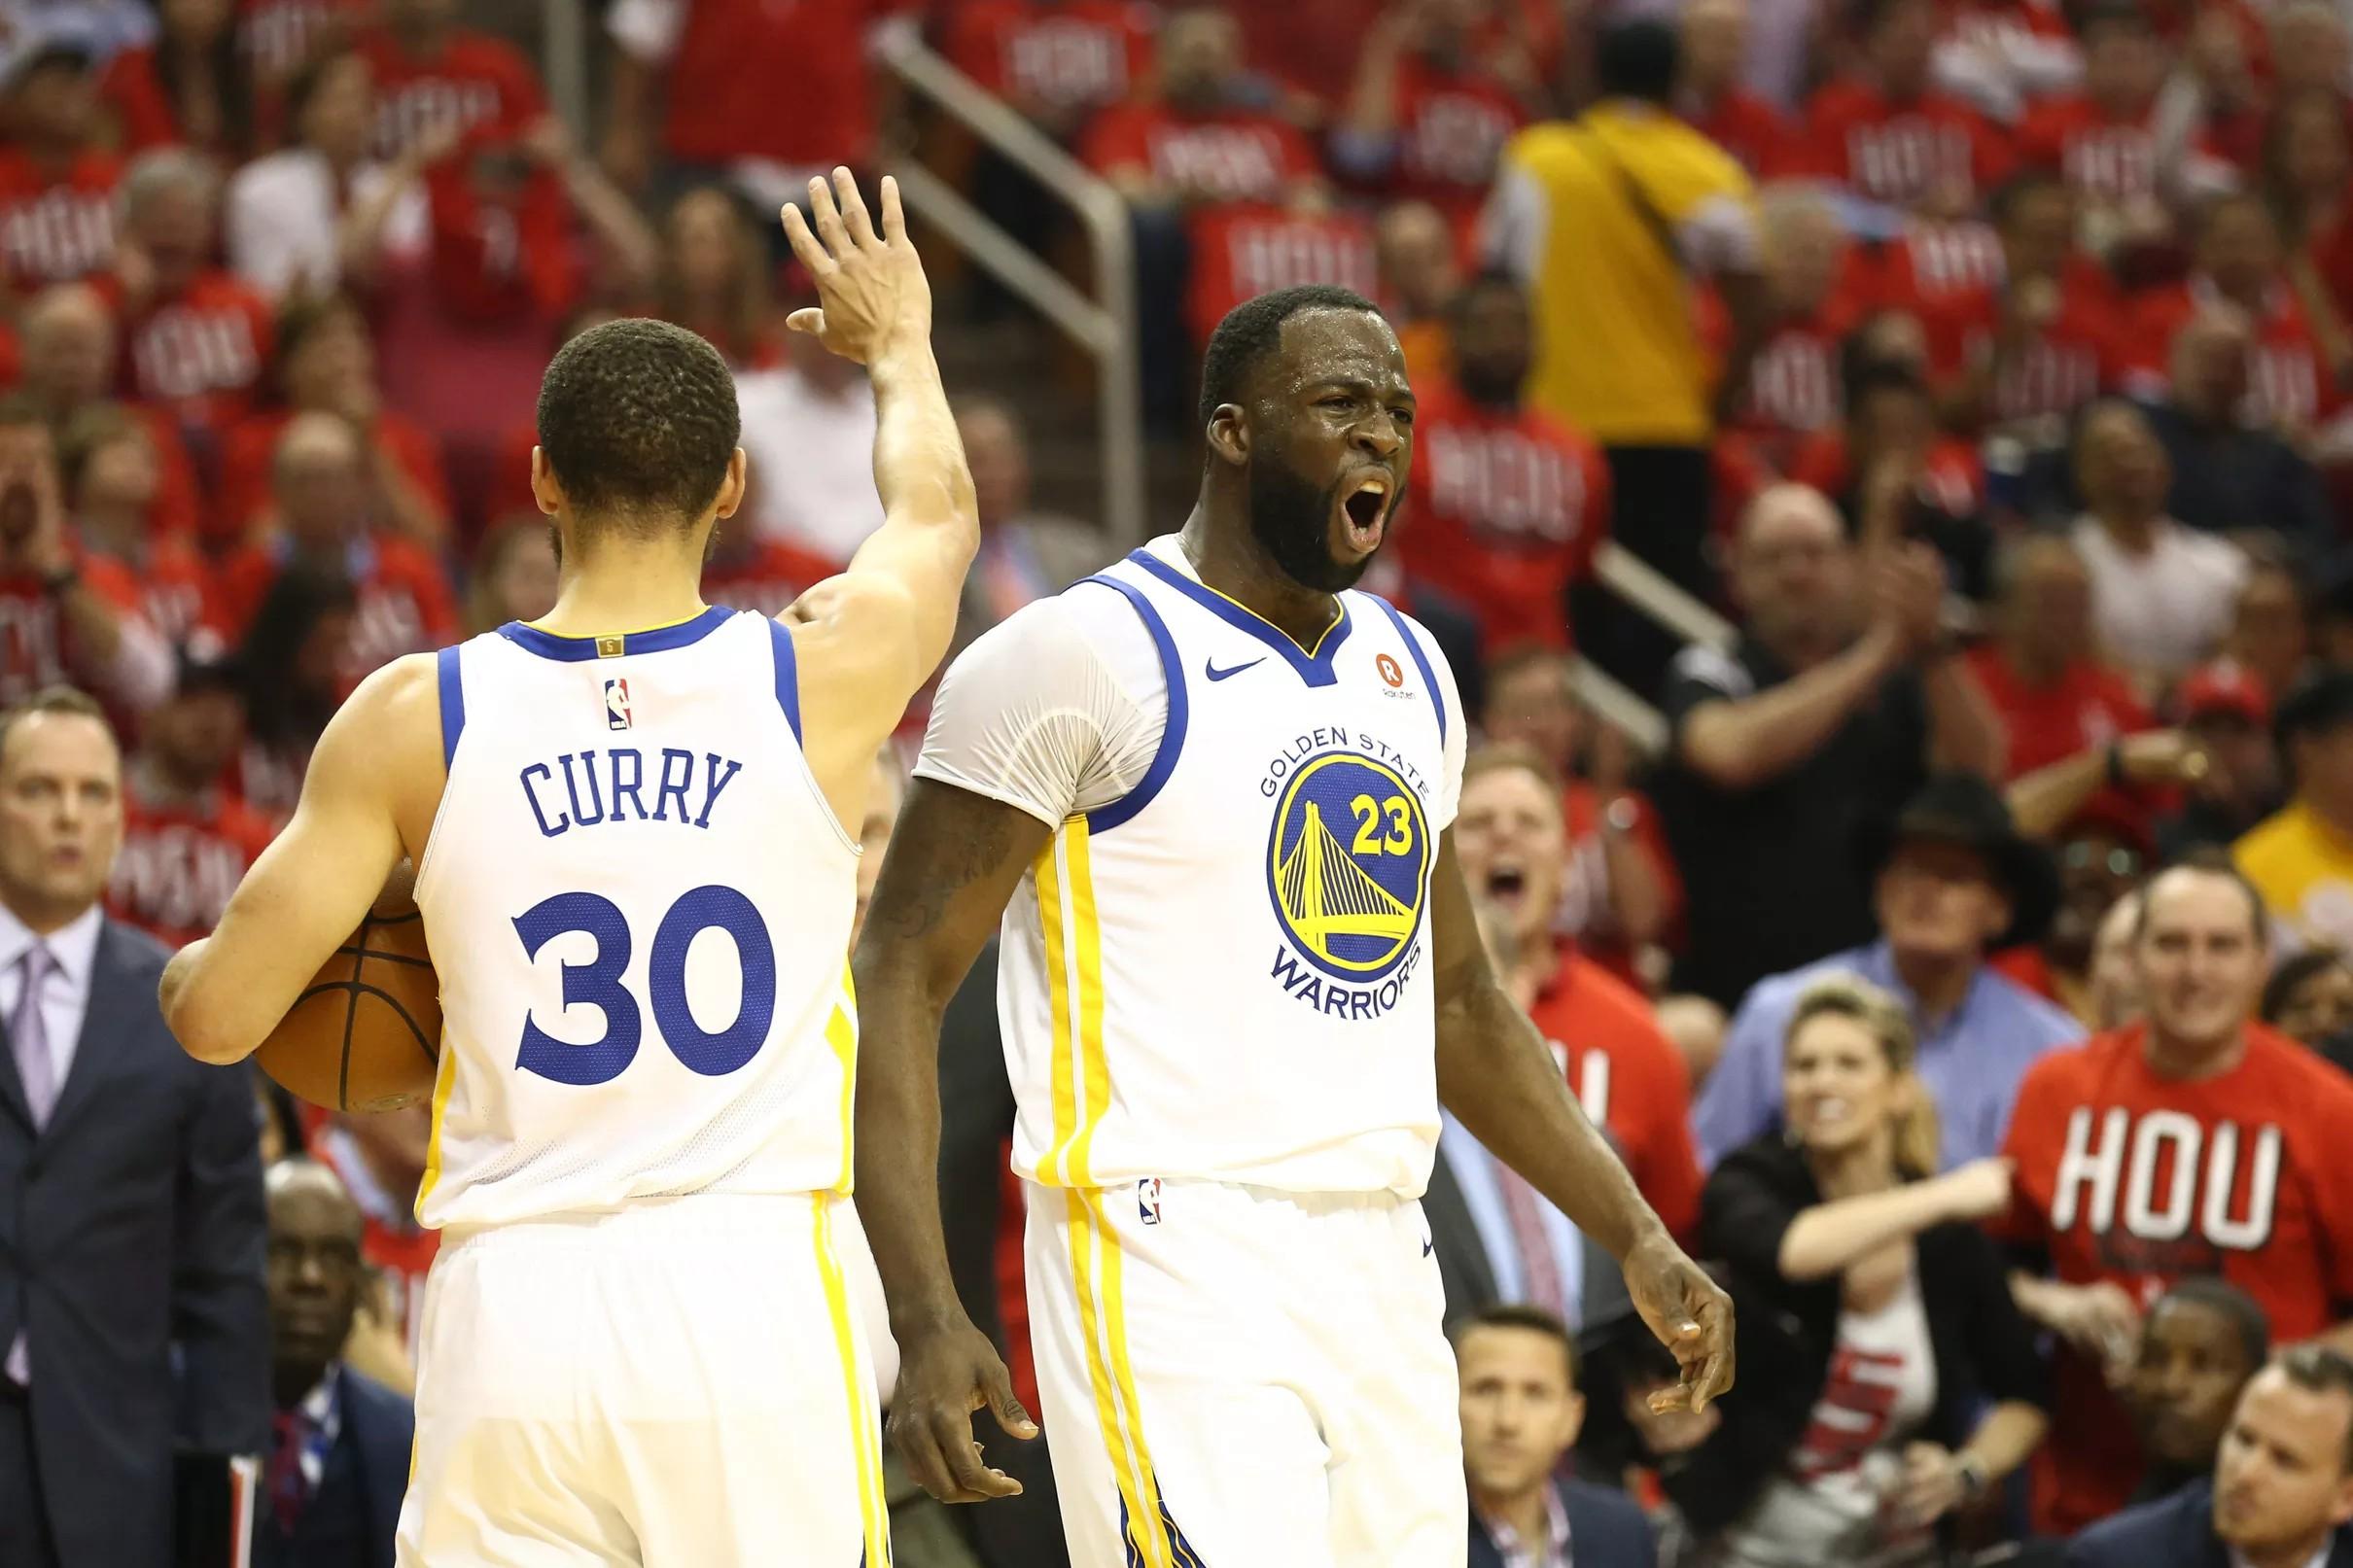 Warriors vs. Rockets. Game 1 halftime score: 56-56 at half